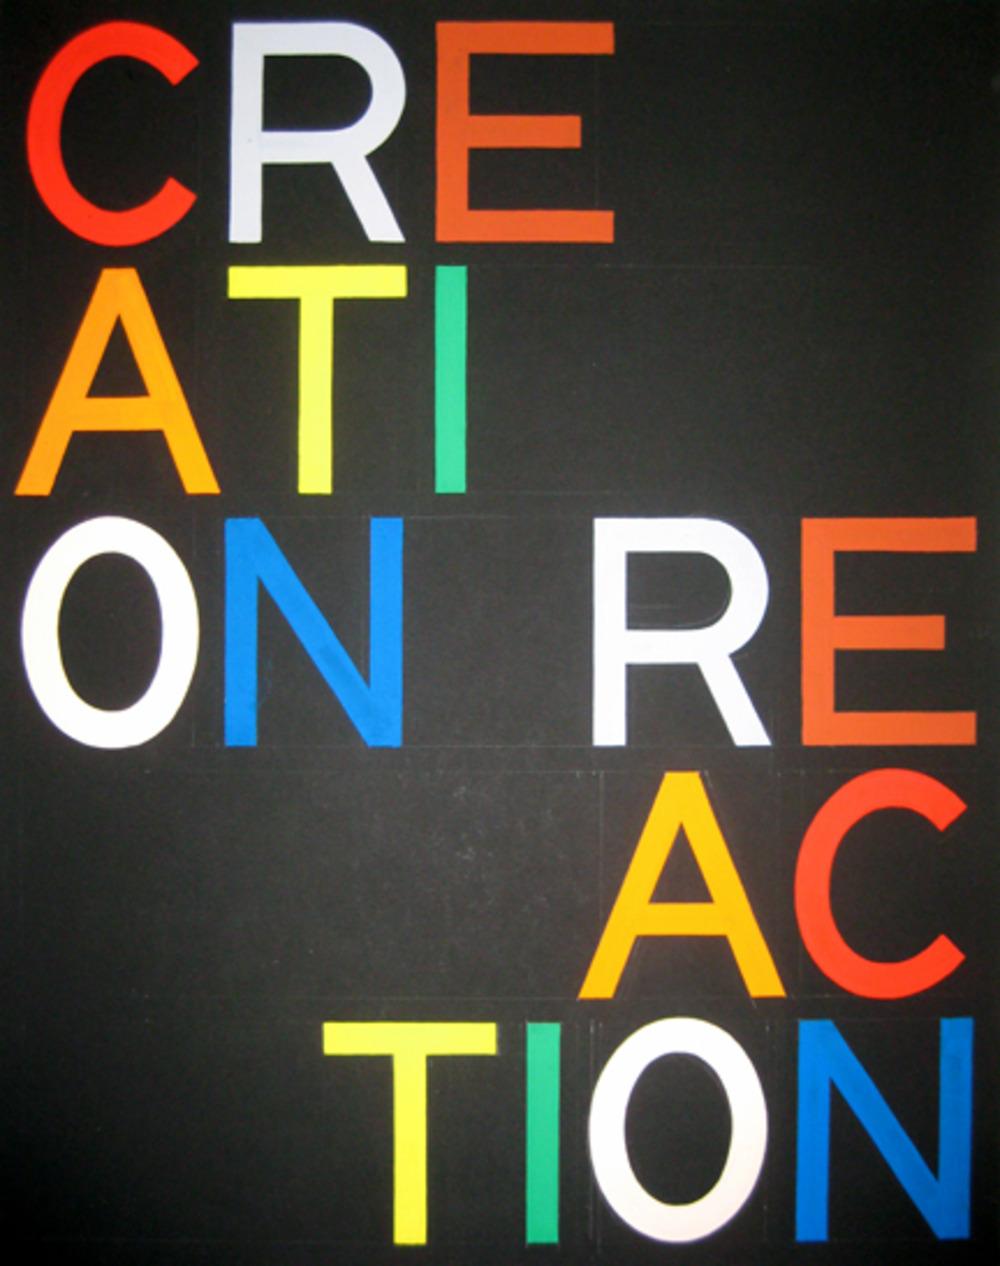 008320creationreaction-tauba-auerbach-large